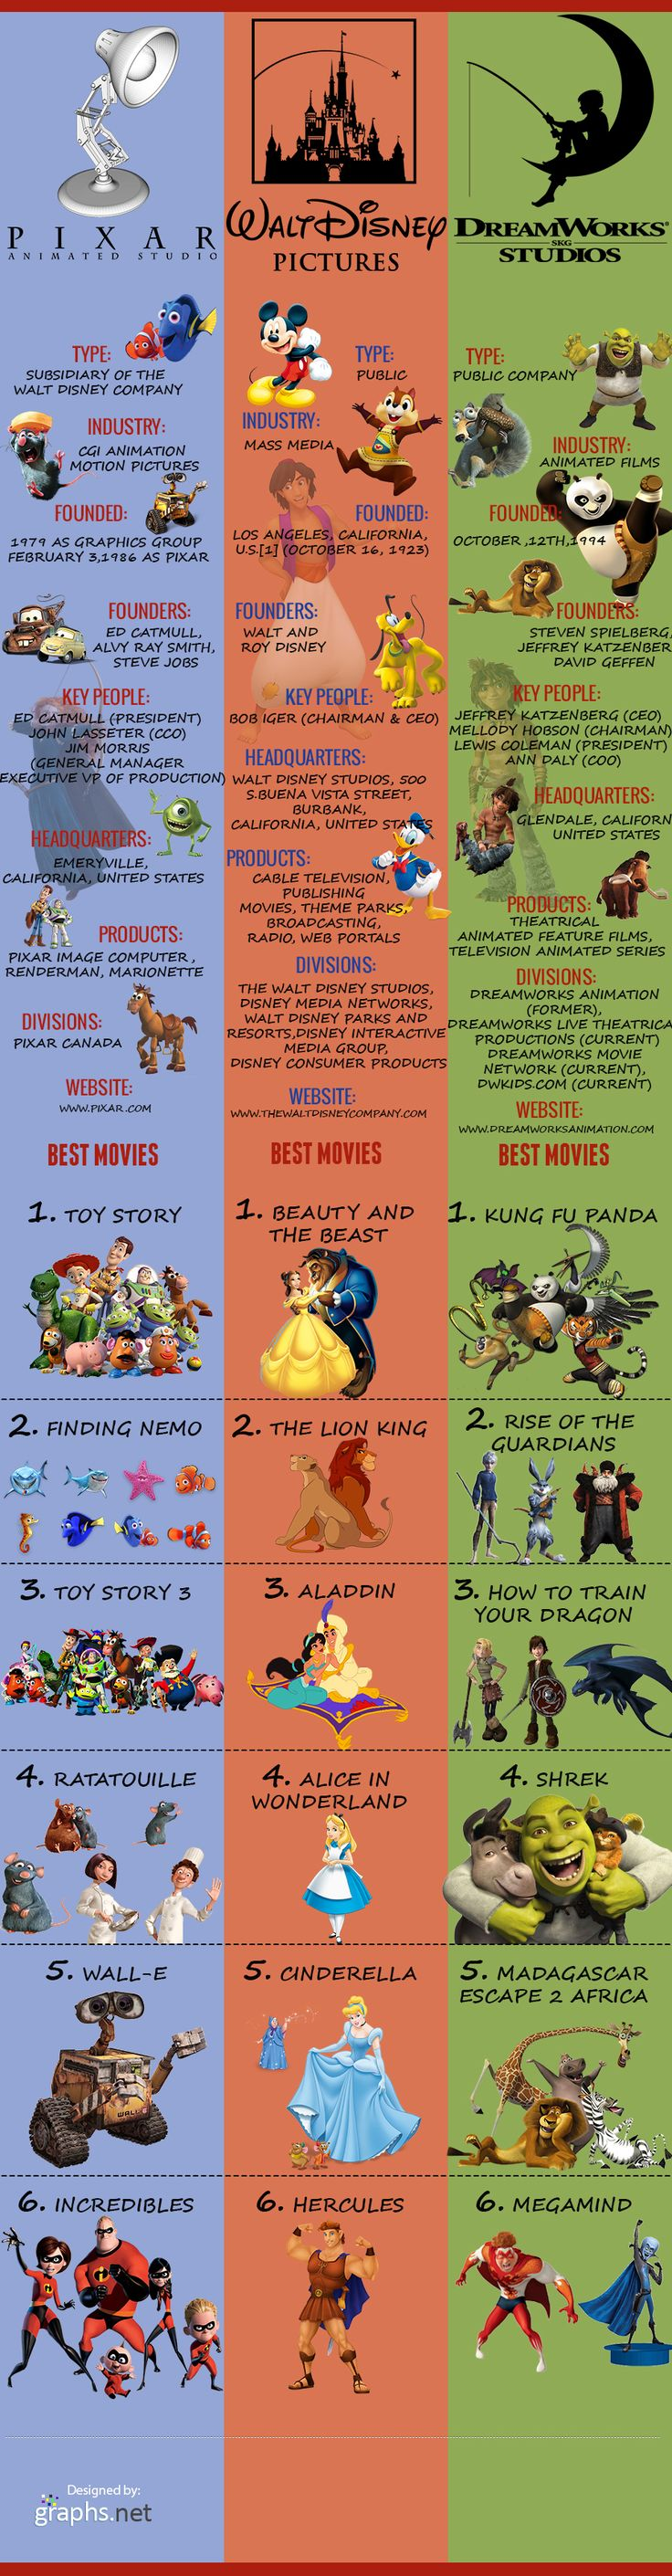 Pixar vs DreamWorks vs Disney – Comparative Statistics #Infographic #infografía